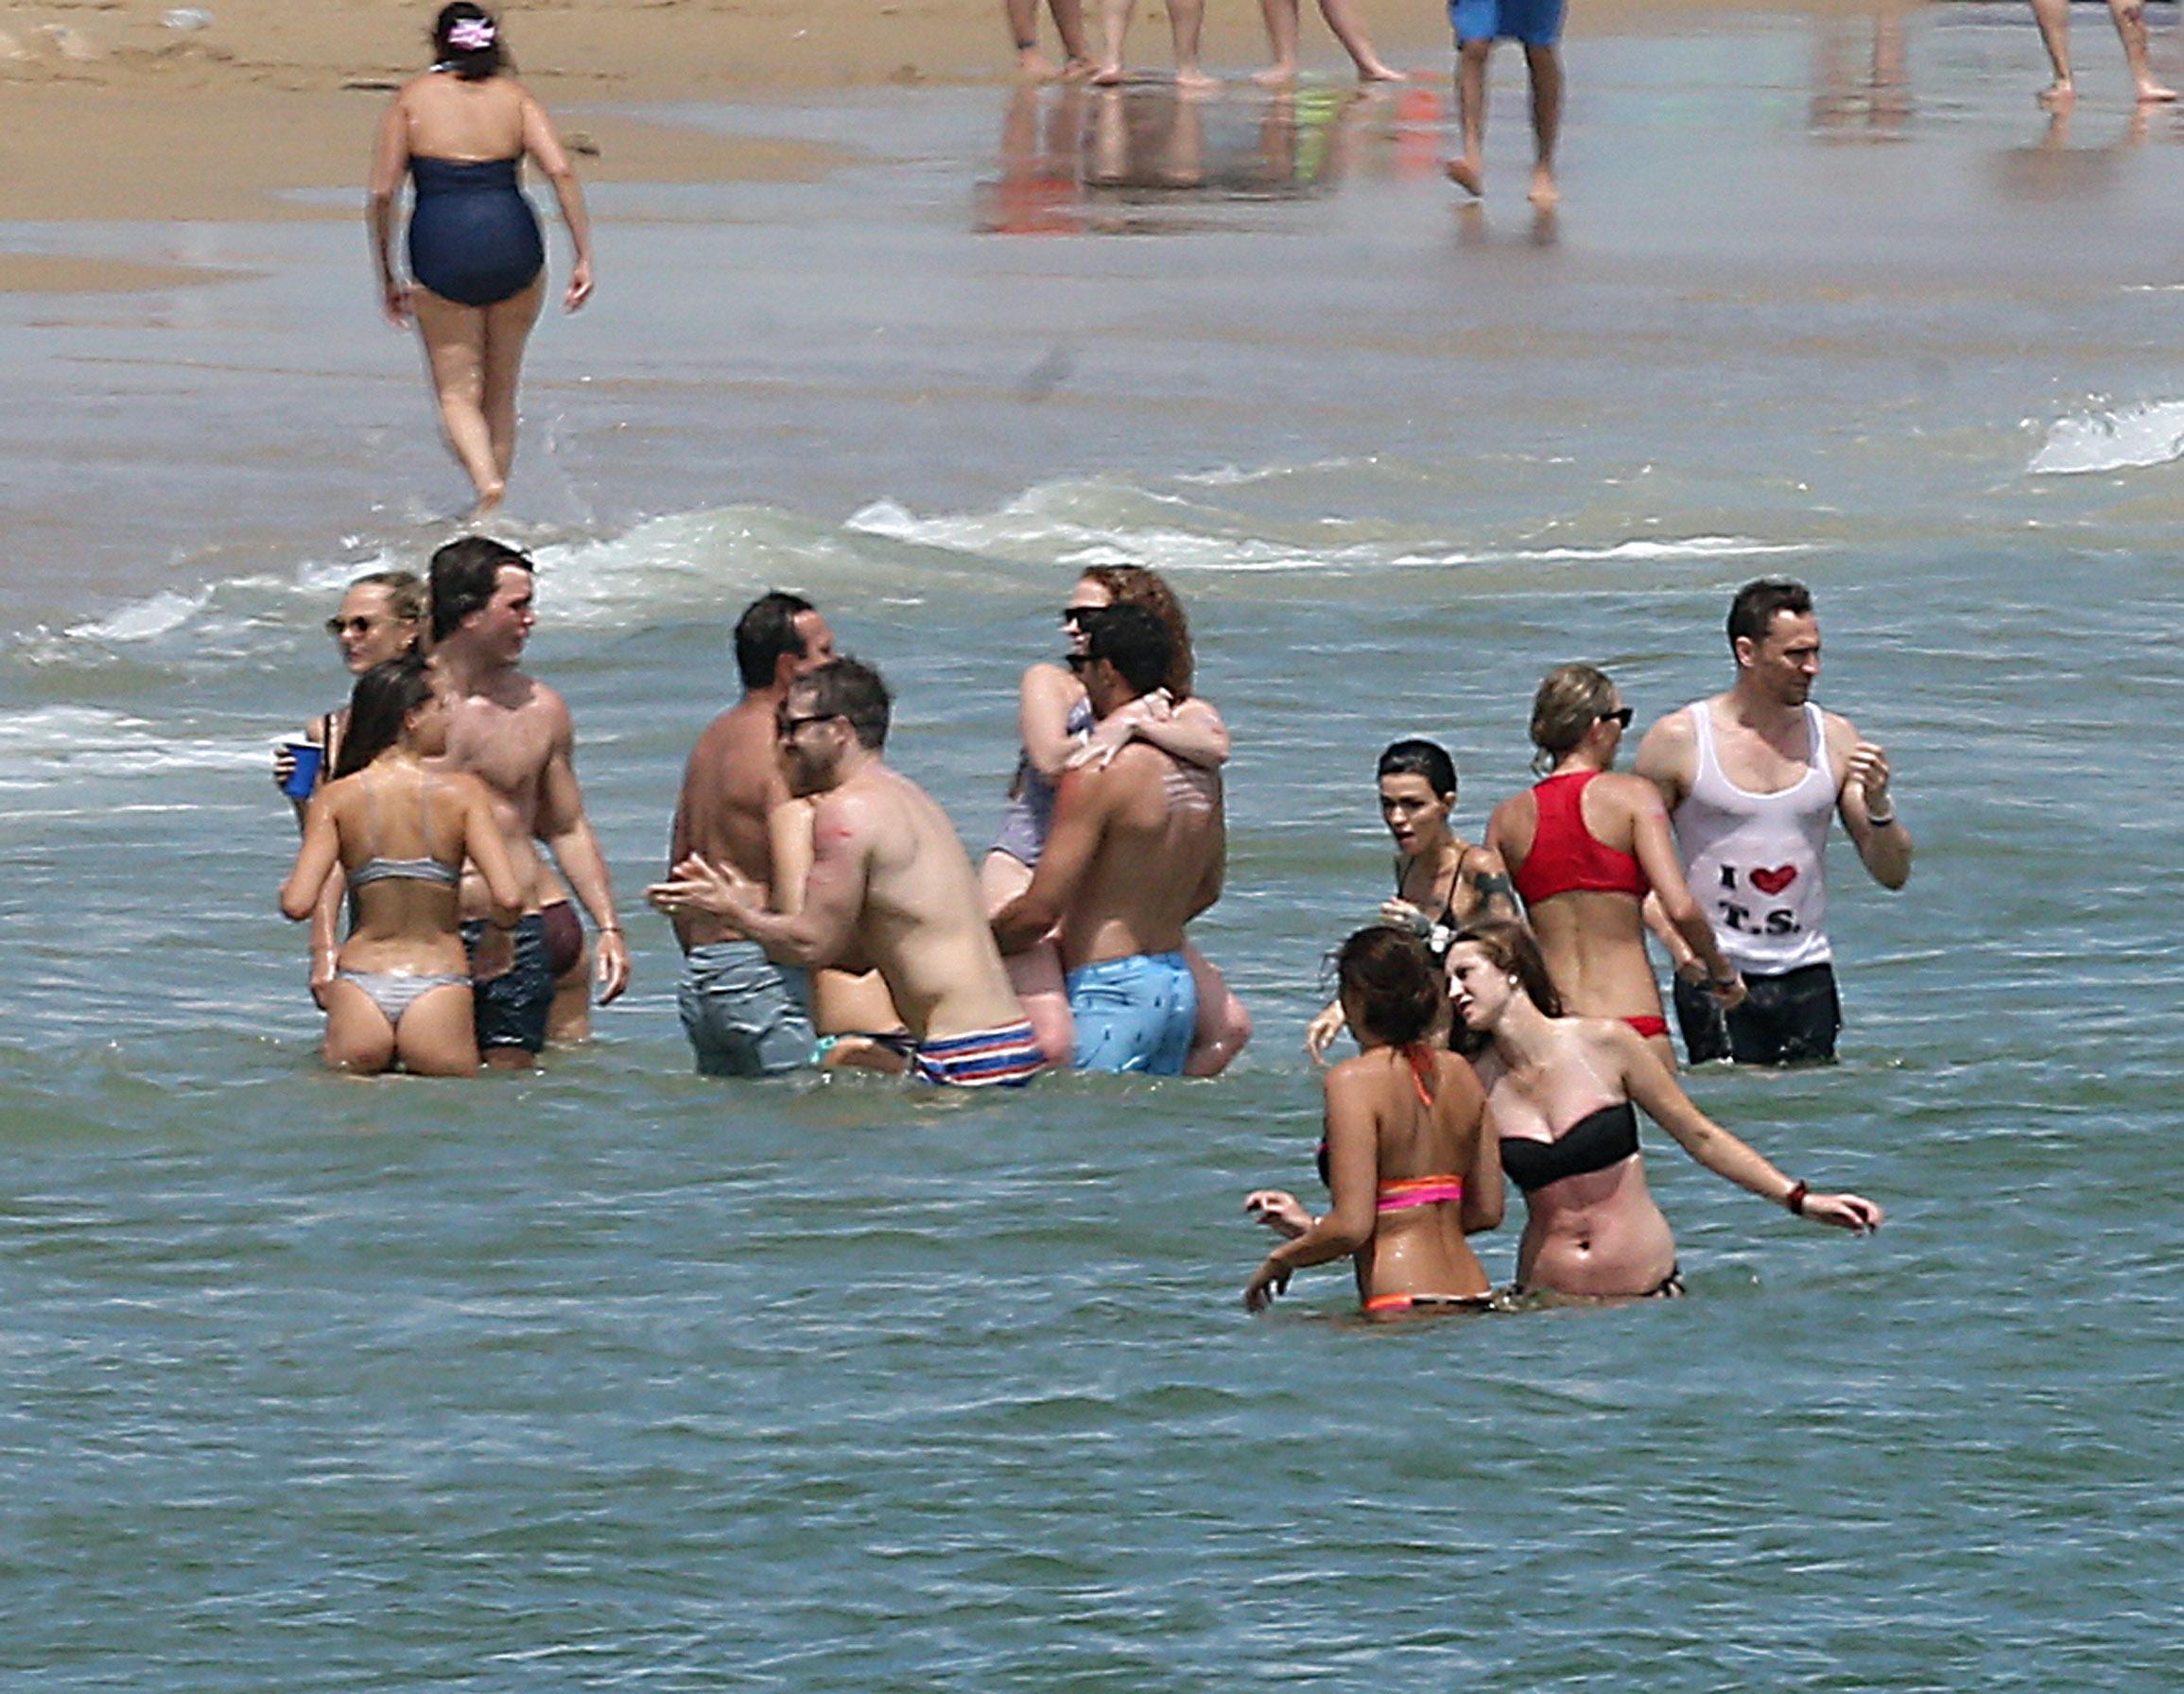 EXCLUSIVE: Taylor Swift celebrates the 4th of July with boyfriend Tom Hiddleston, Cara Delevinge, Karlie Kloss, Ruby Rose, Blake Lively, Ryan Reynolds, and Gigi Hadid at Taylor's house in Rhode Island <P> Pictured: taylor swift, tom hiddleston, blake lively, ryan reynolds, ruby rose, gigi hadid, cara delevingne,  <B>Ref: SPL1312971  030716   EXCLUSIVE</B><BR/> Picture by: Ryan Turgeon / Splash News<BR/> </P><P> <B>Splash News and Pictures</B><BR/> Los Angeles:310-821-2666<BR/> New York:212-619-2666<BR/> London:870-934-2666<BR/> photodesk@splashnews.com<BR/> </P>